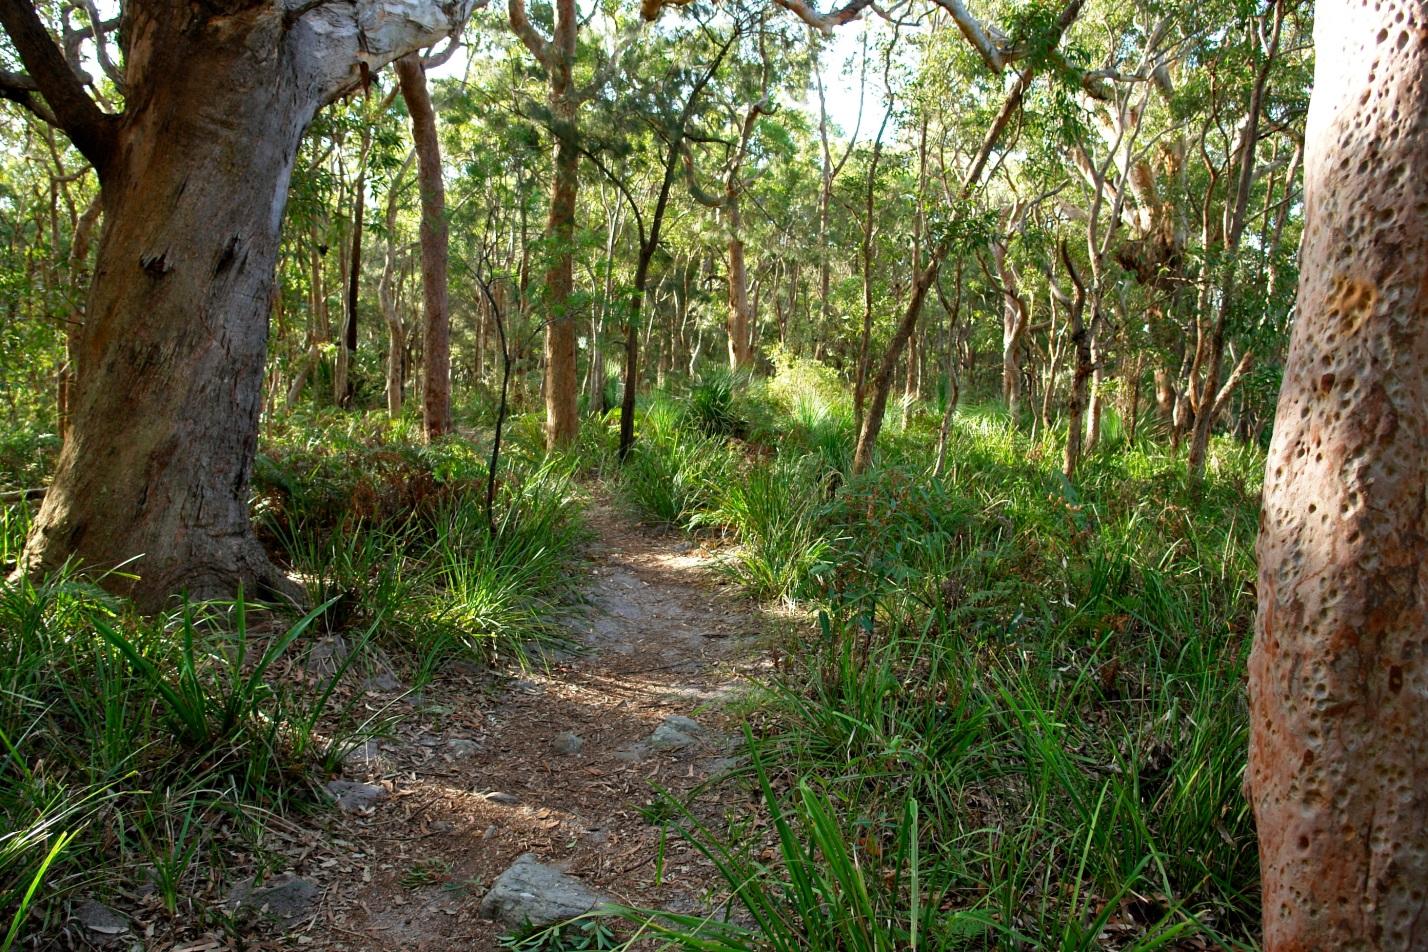 rentalcars24h blog sydney park7 #1 Sydney Sight To Admire Australian Nature!